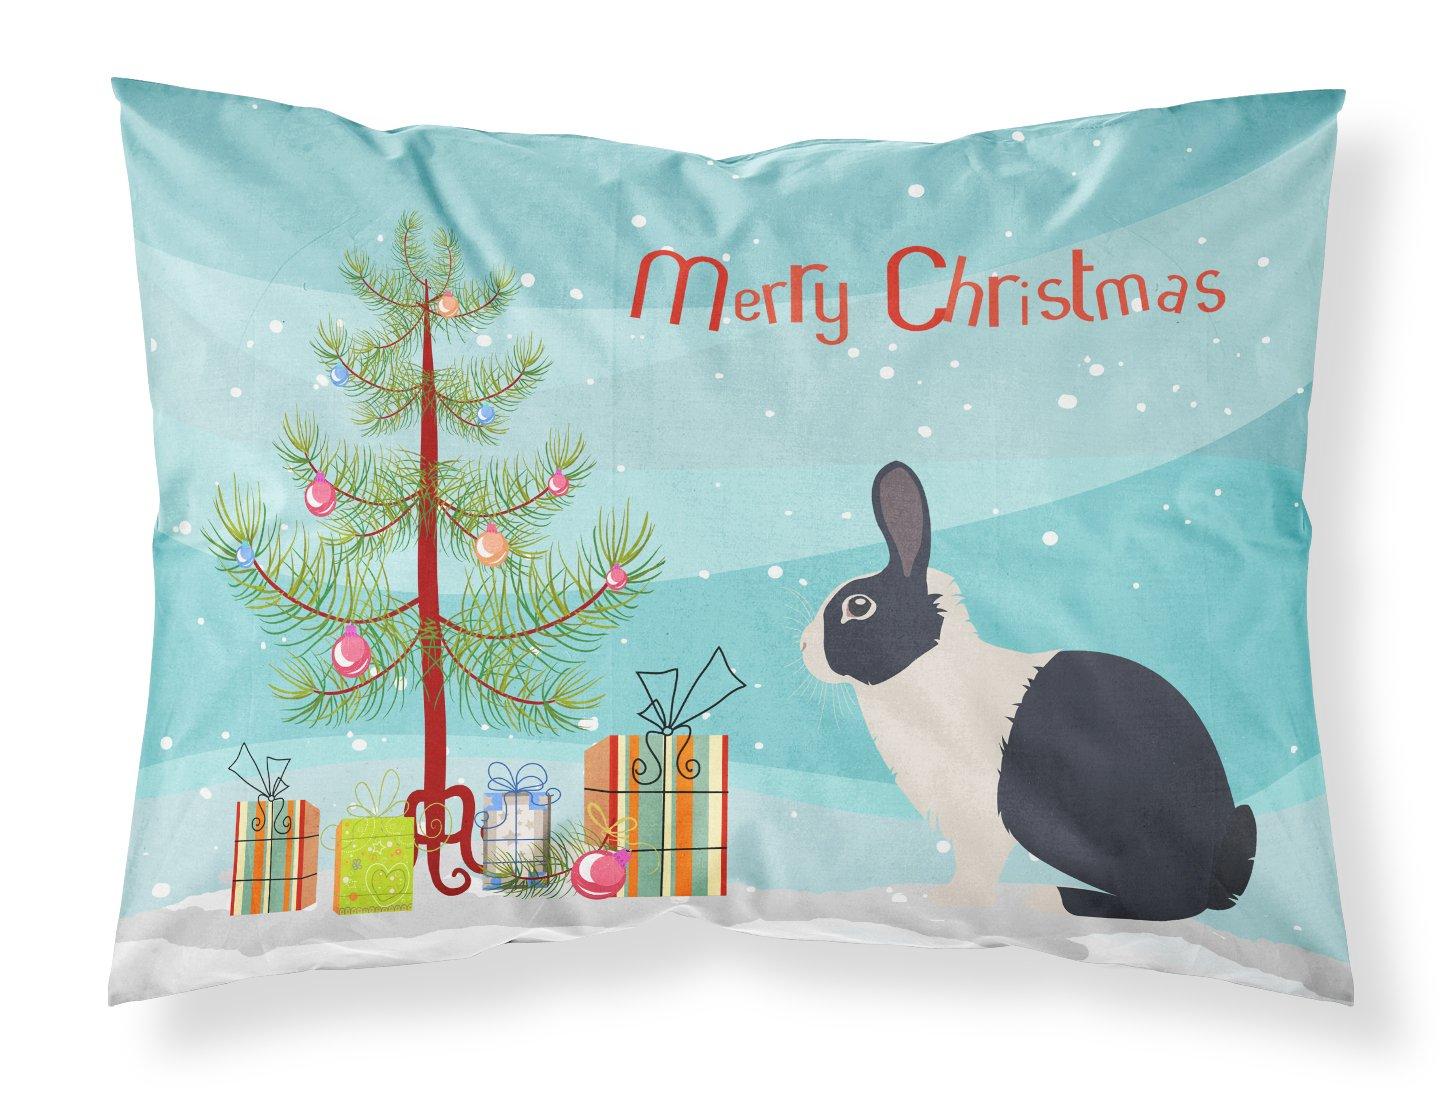 Caroline 's Treasures Dutch Rabbitクリスマス枕カバー、標準、マルチカラー B078T37F9P